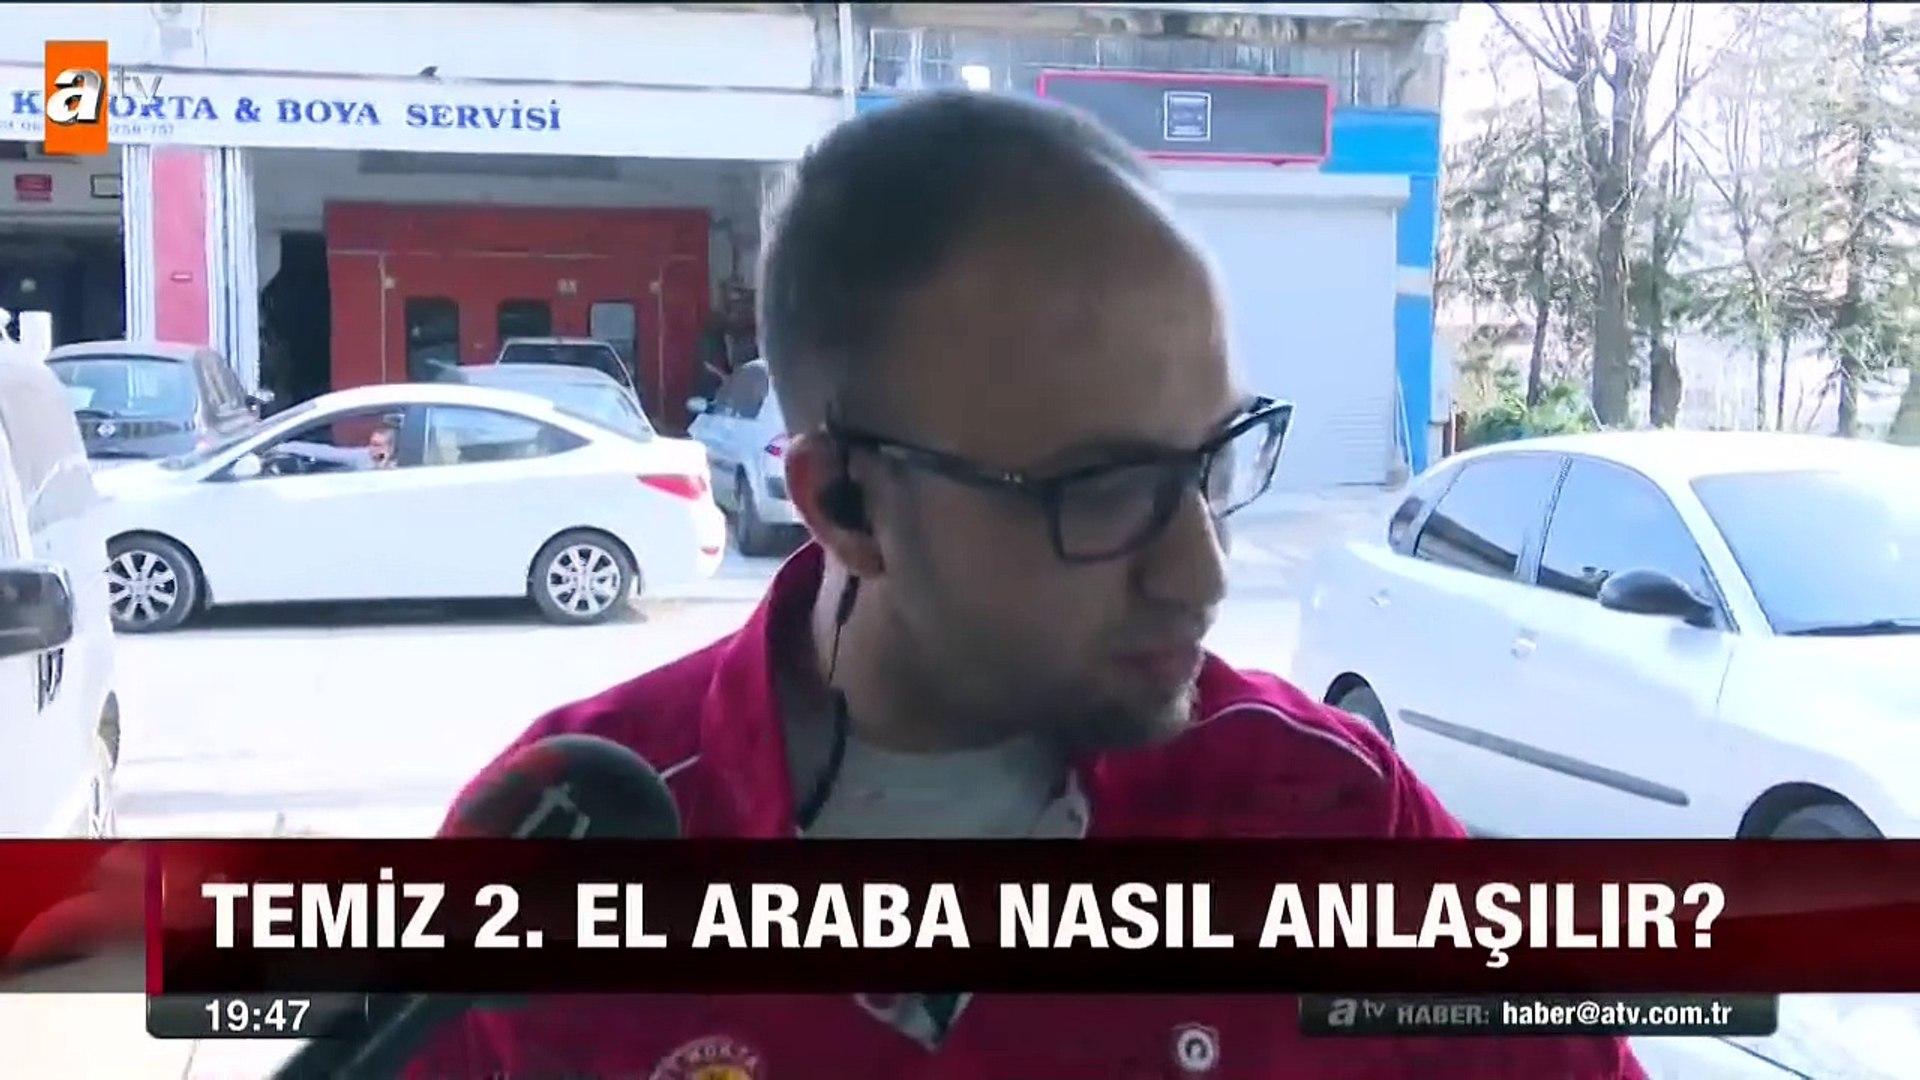 temiz 2 el araba nasil anlasilir